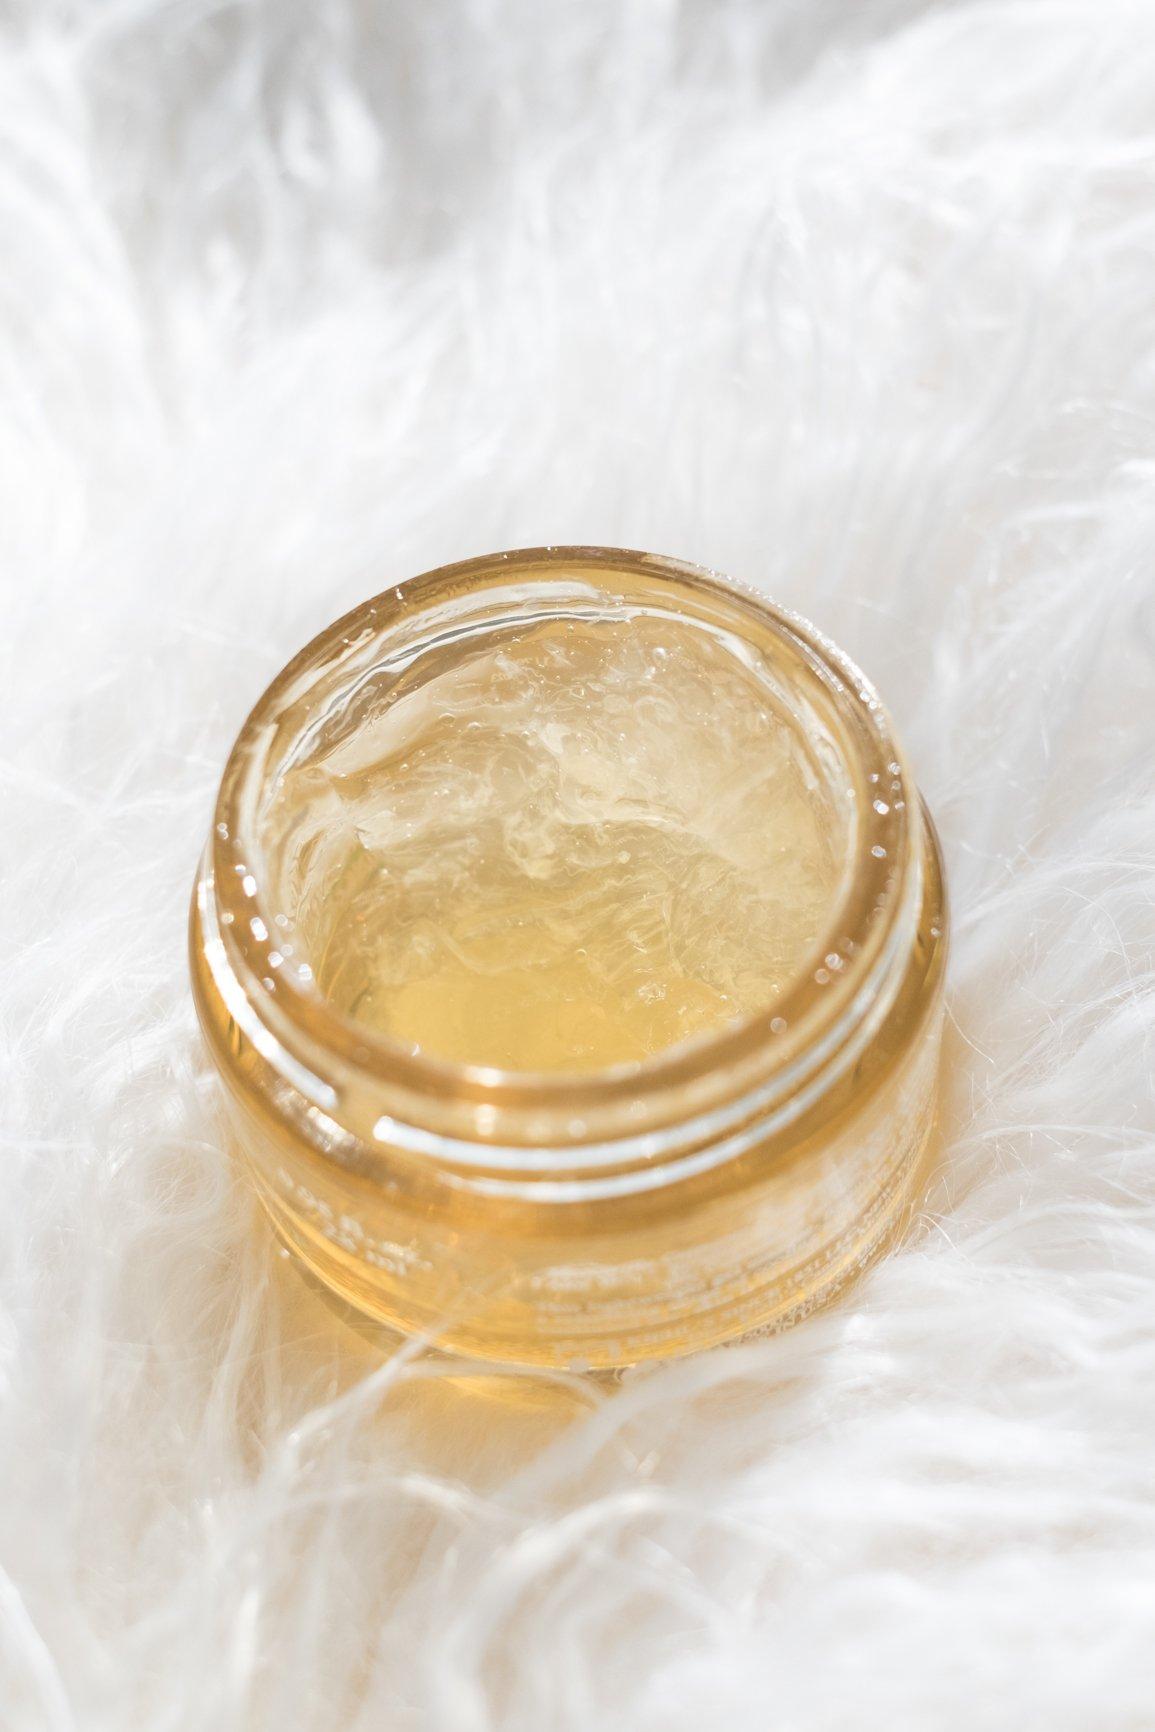 sunkissedblush-kiehls-calendula-aloe-mask (3 of 4)